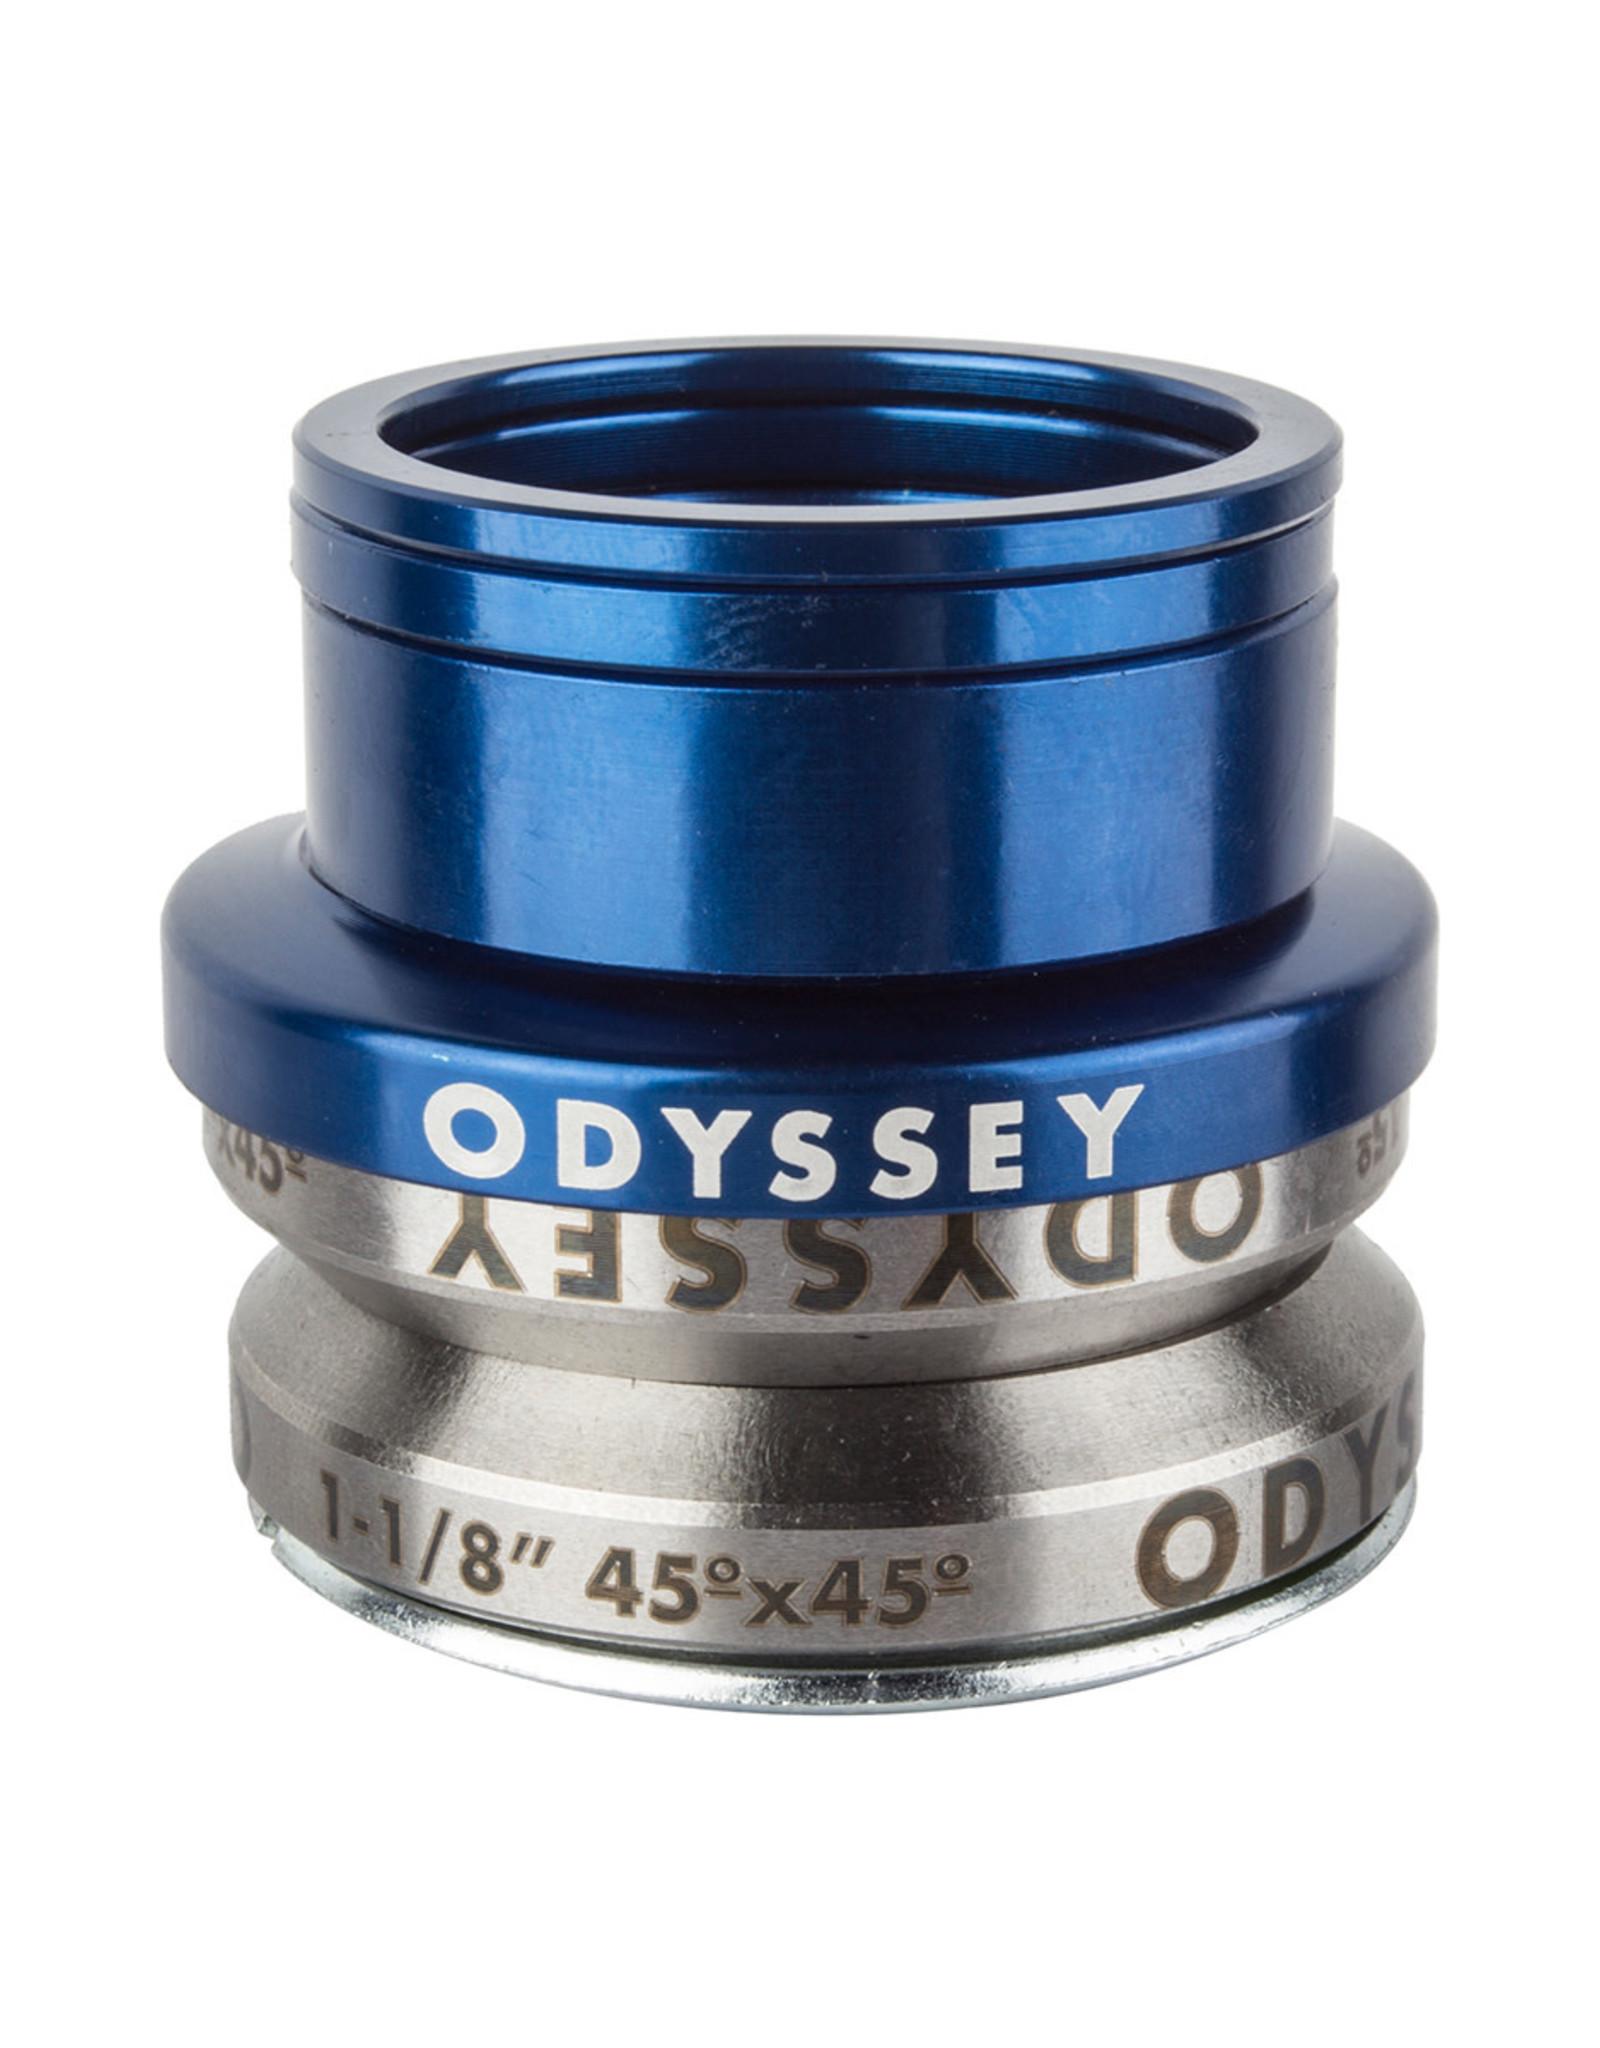 Odyssey Odyssey Intergrated Pro Headset 1 1/8